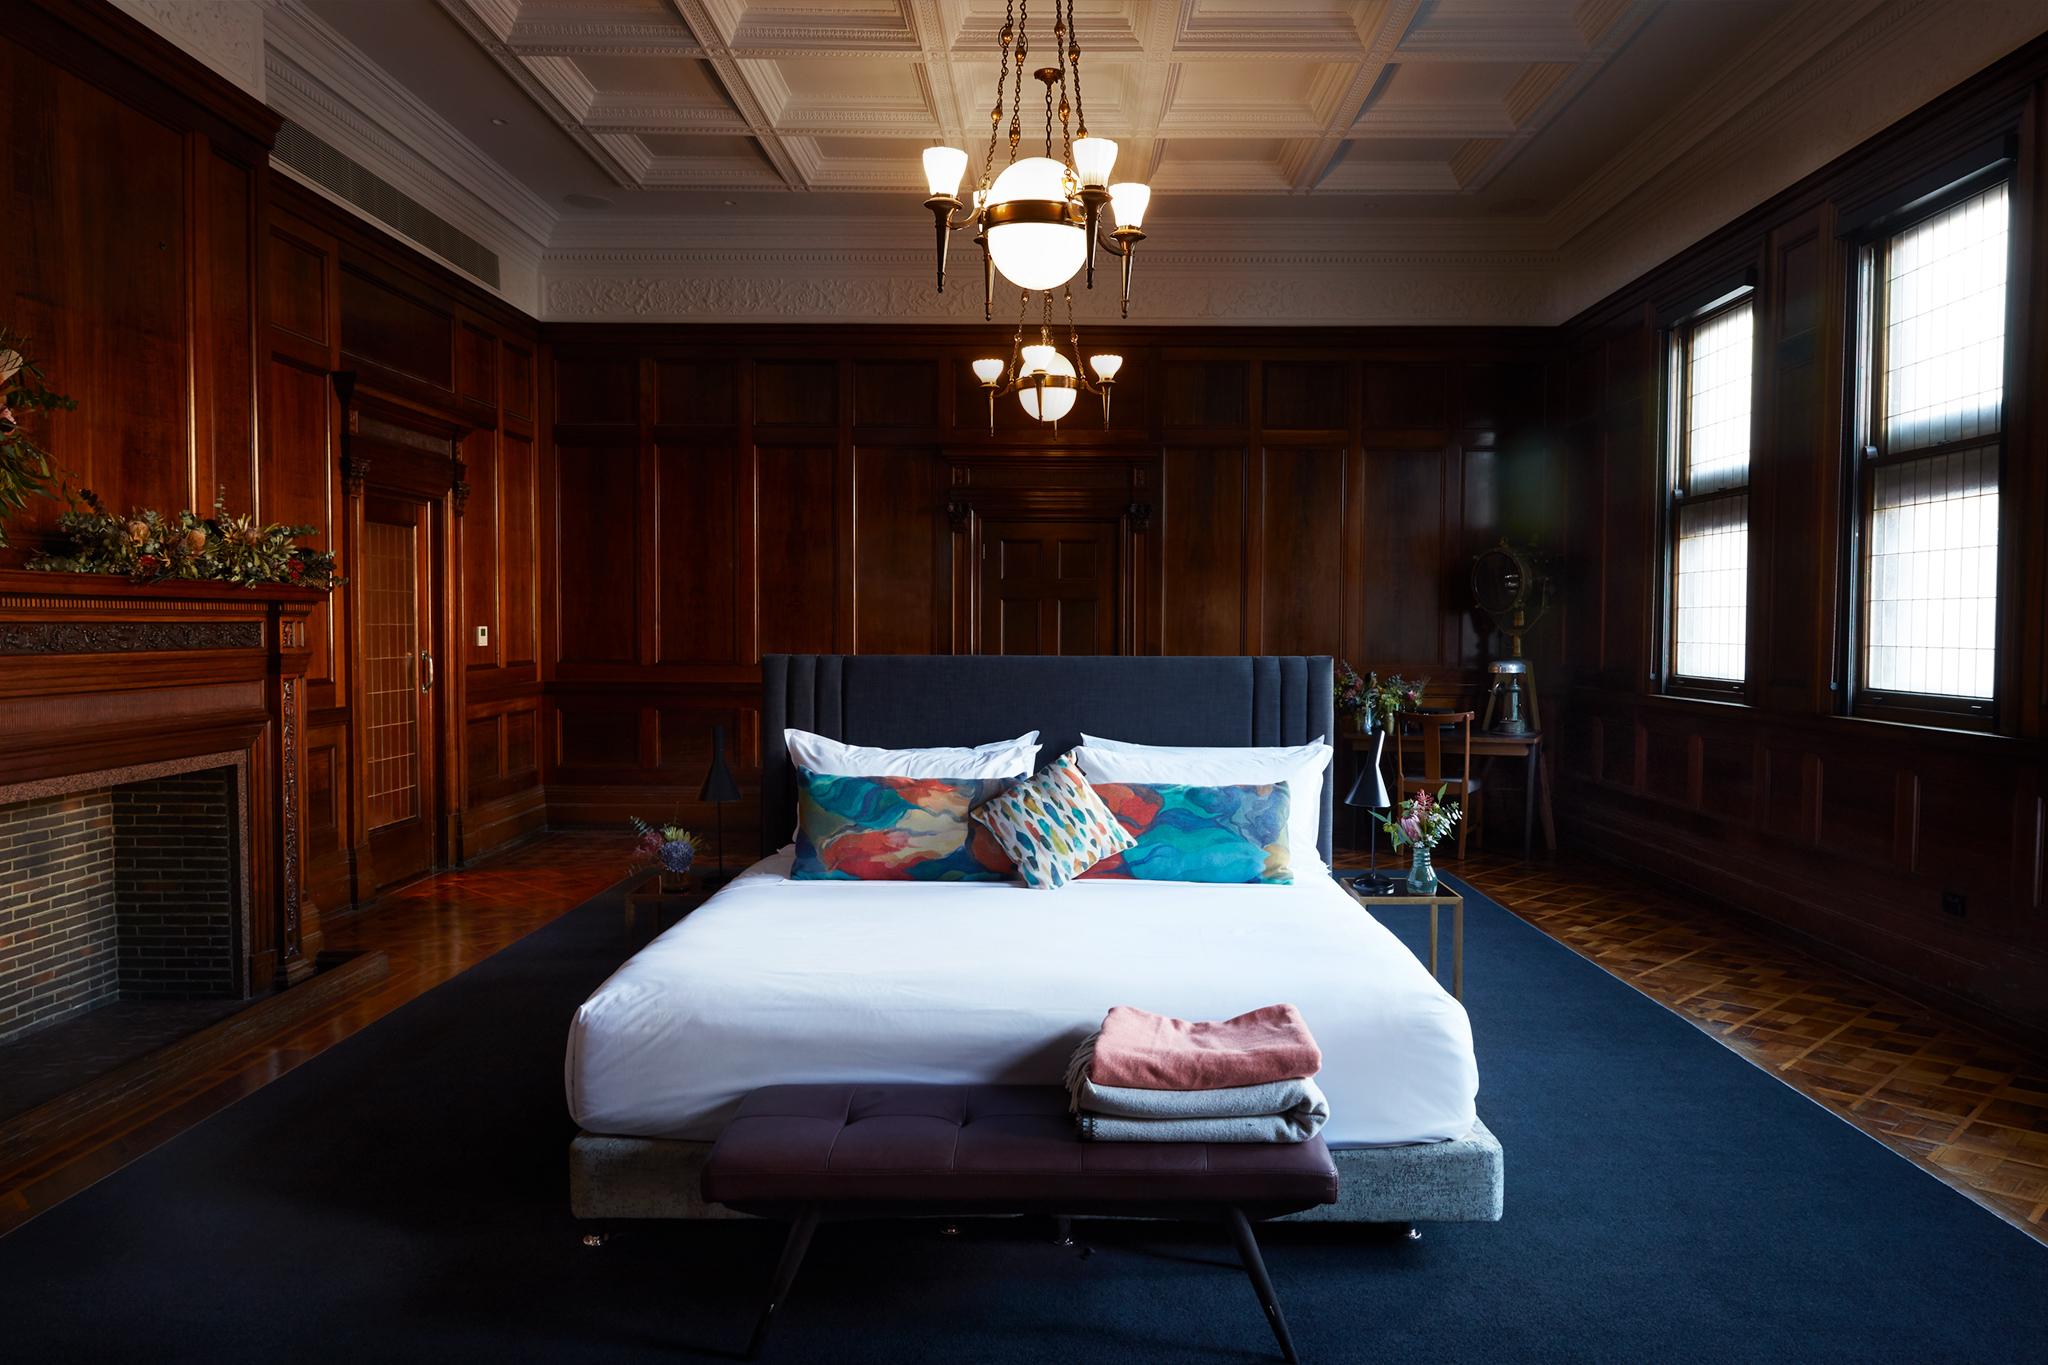 190801-The-Old-Clare-Hotel-CUB-Suite1037_HERO.jpg